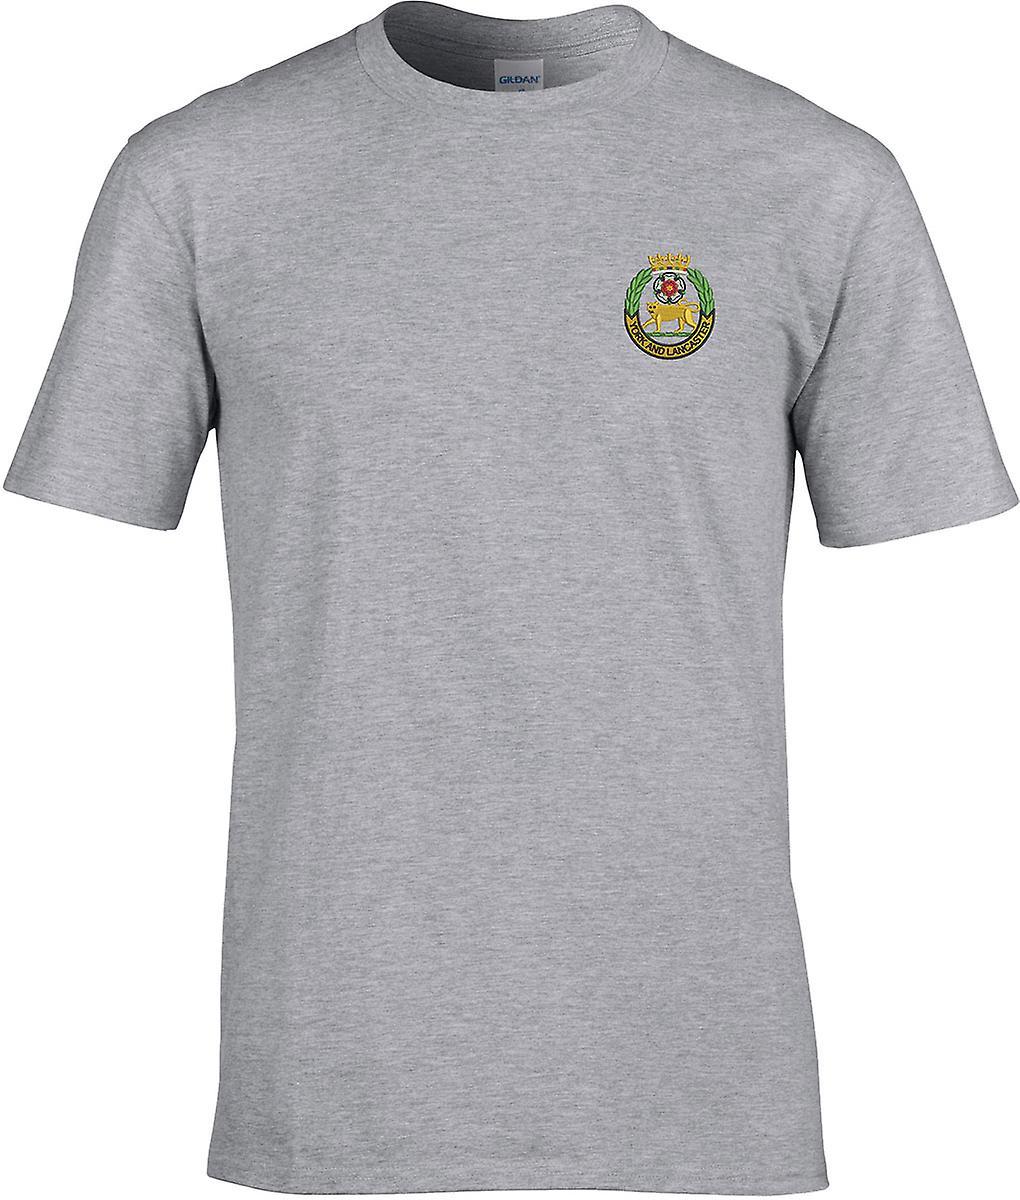 York And Lancaster Regiment - Licensed British Army Embroidered Premium T-Shirt